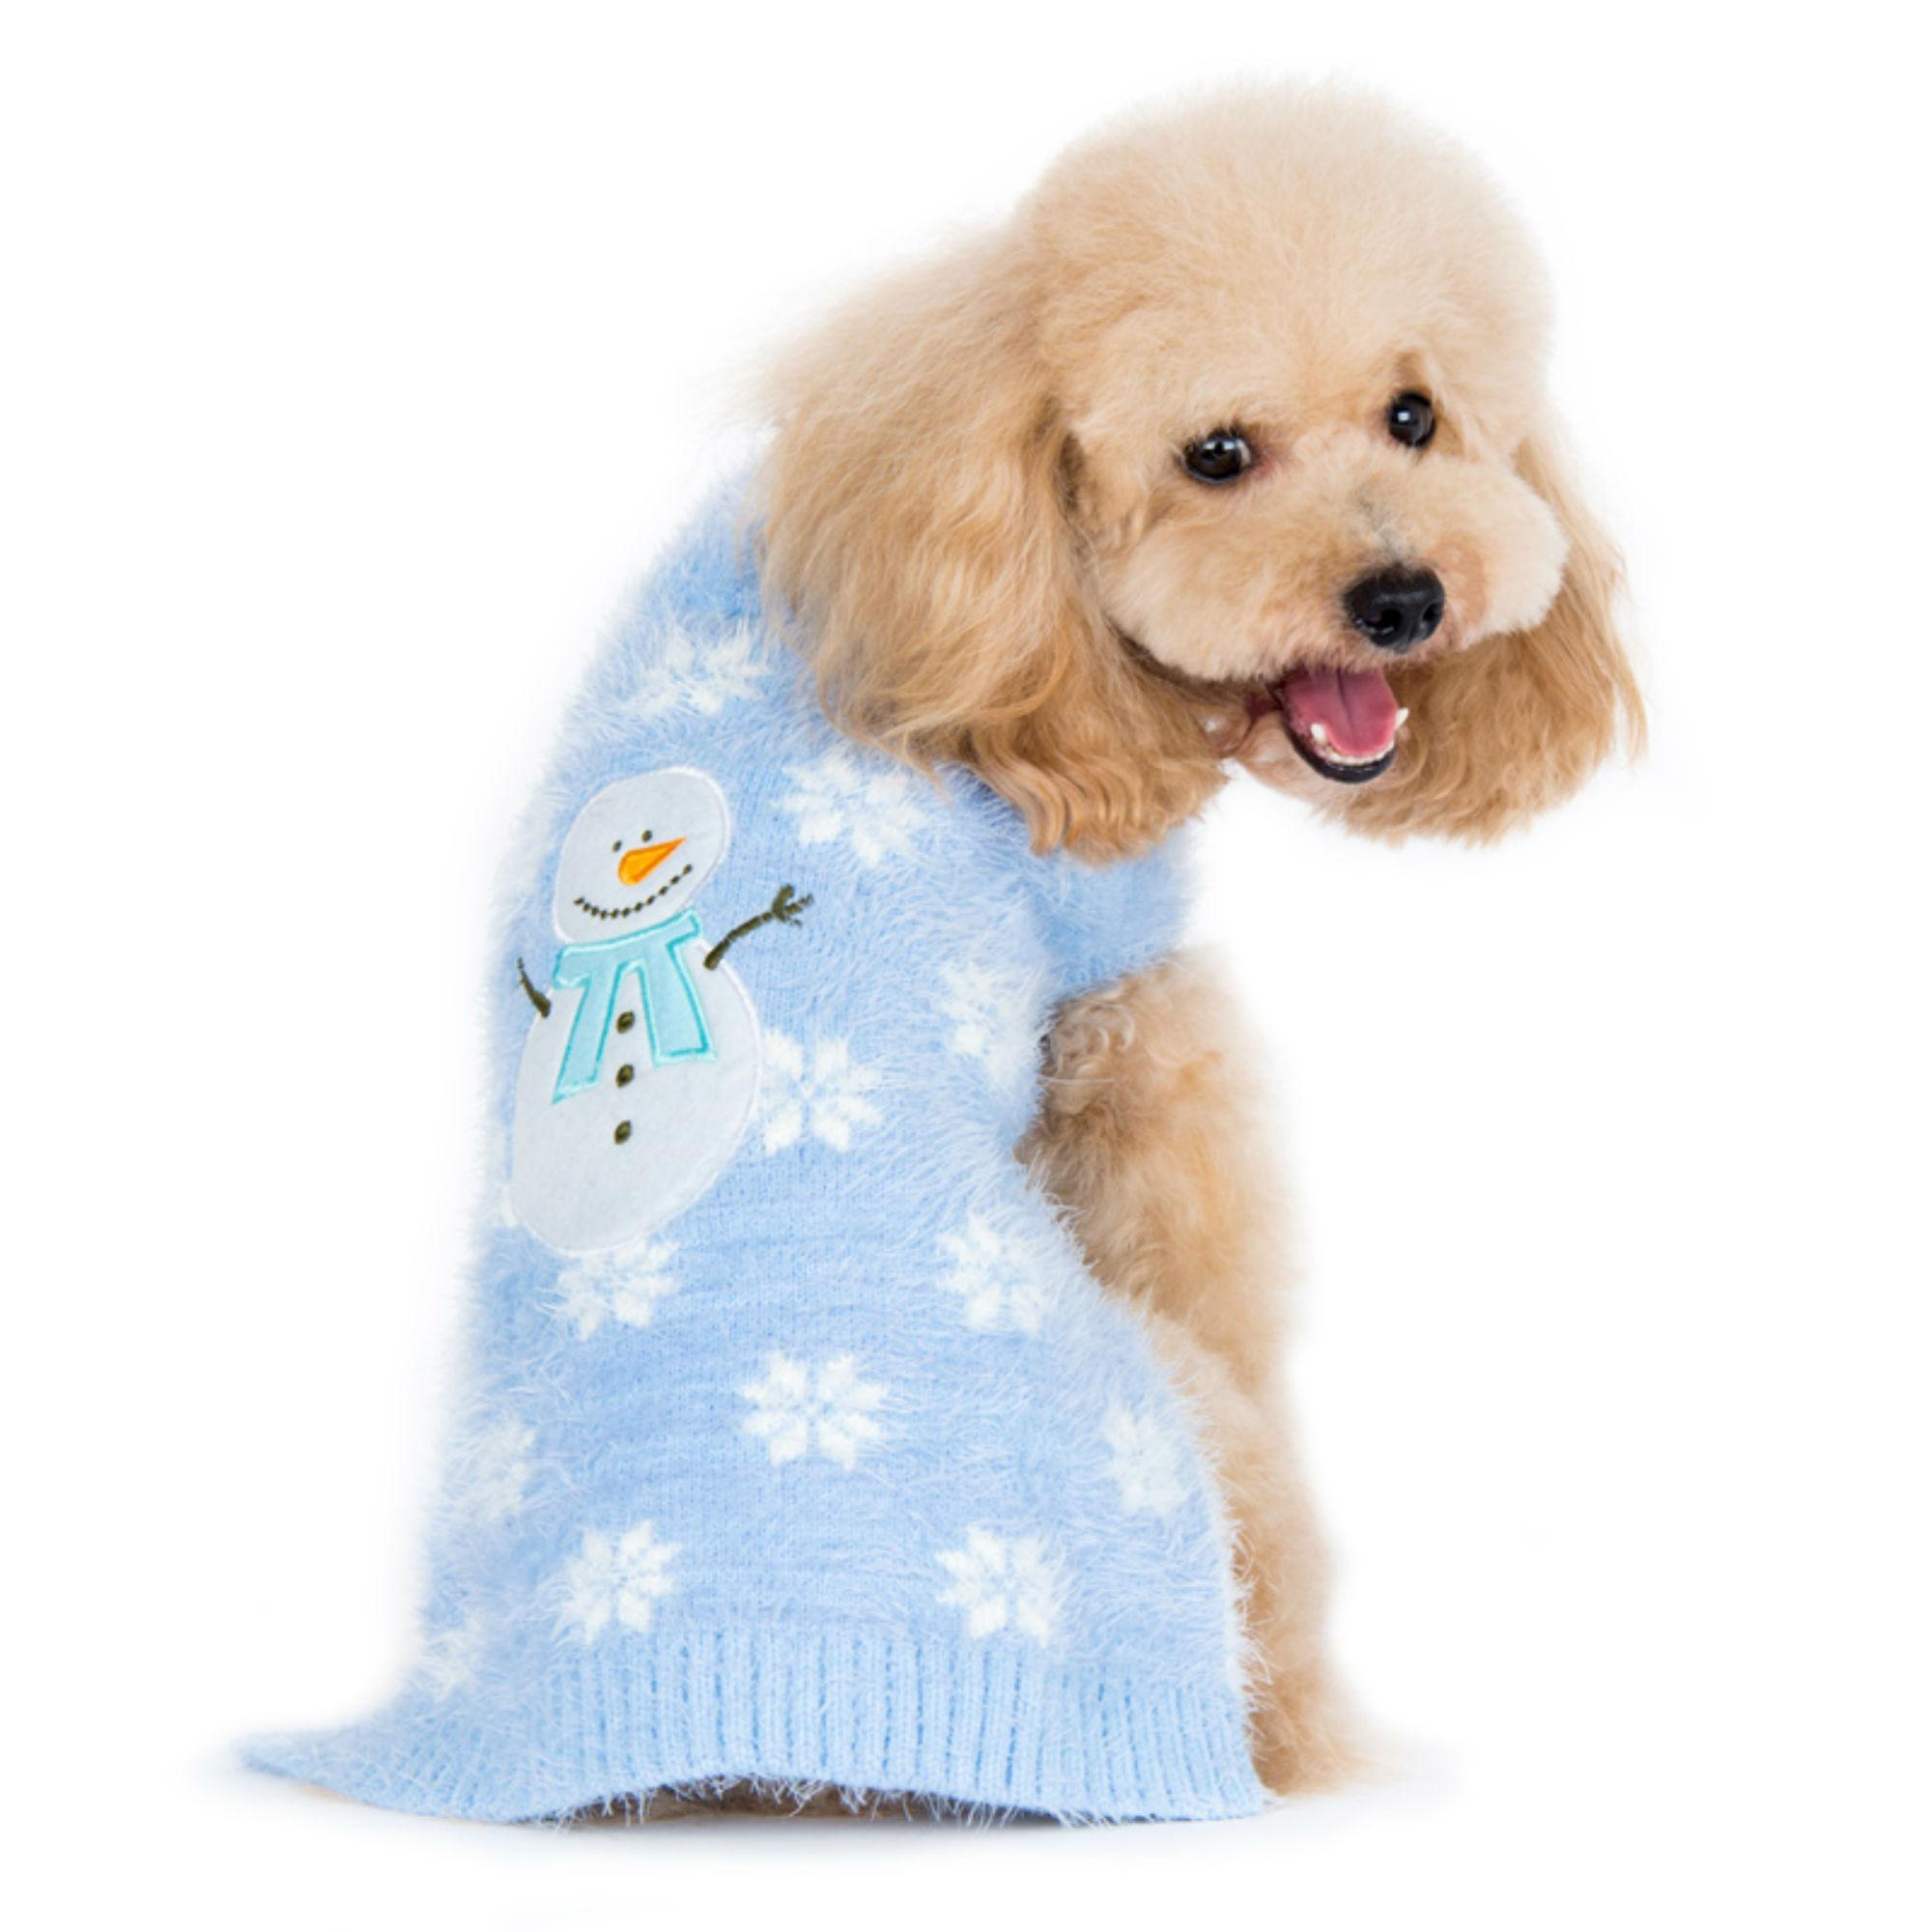 Puppypawer Snowman Dog Sweater By Dogo Blue Xx Large Walmart Com